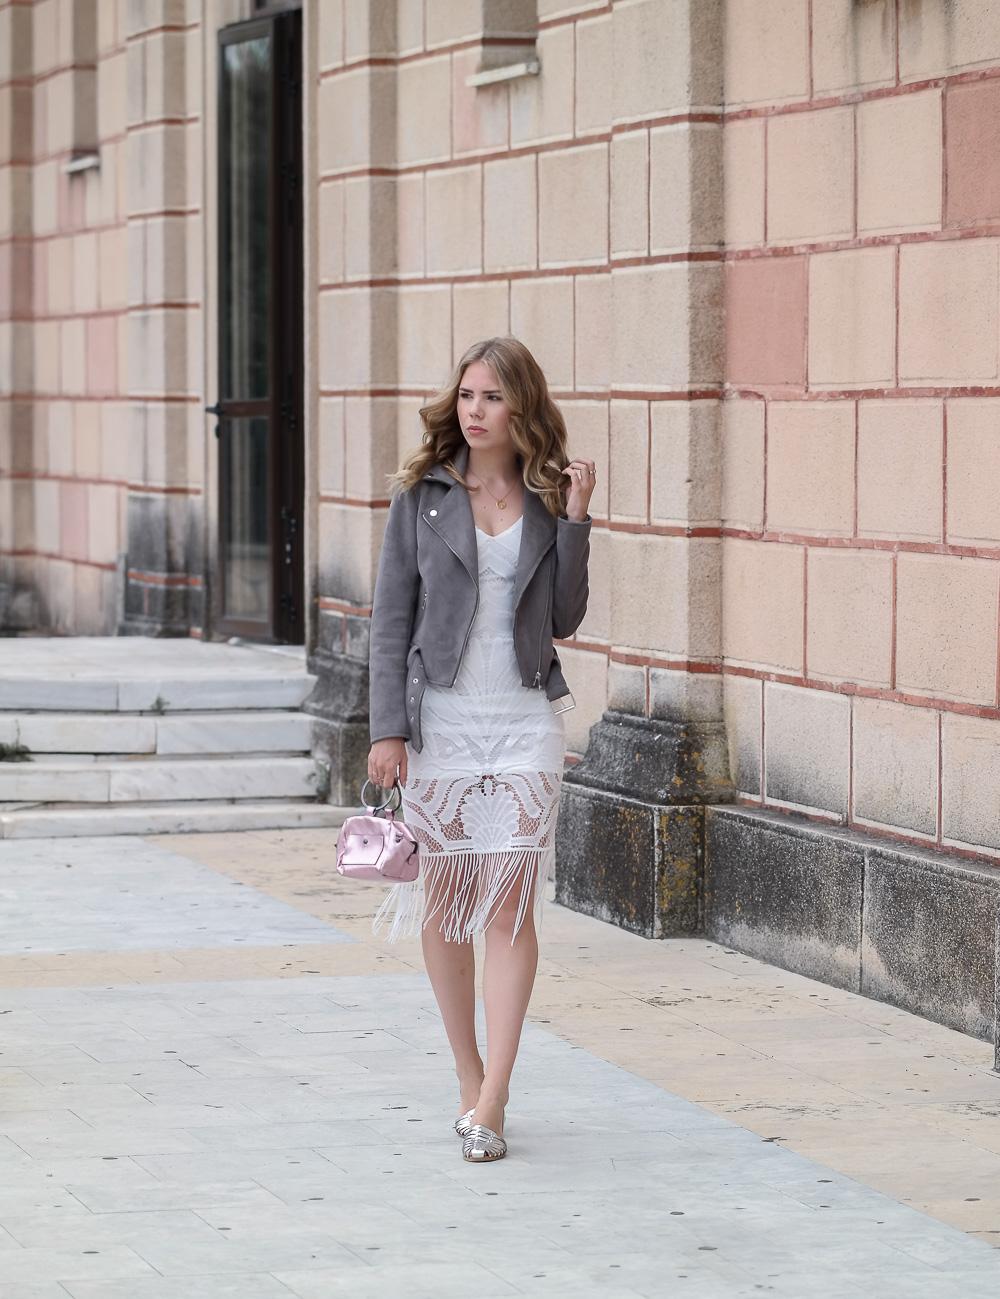 New-Look-Blogger-Fashion-Mode-Boho-Kleid-Bikerjacke-silberne-Sandaletten-Rosa-Tasche